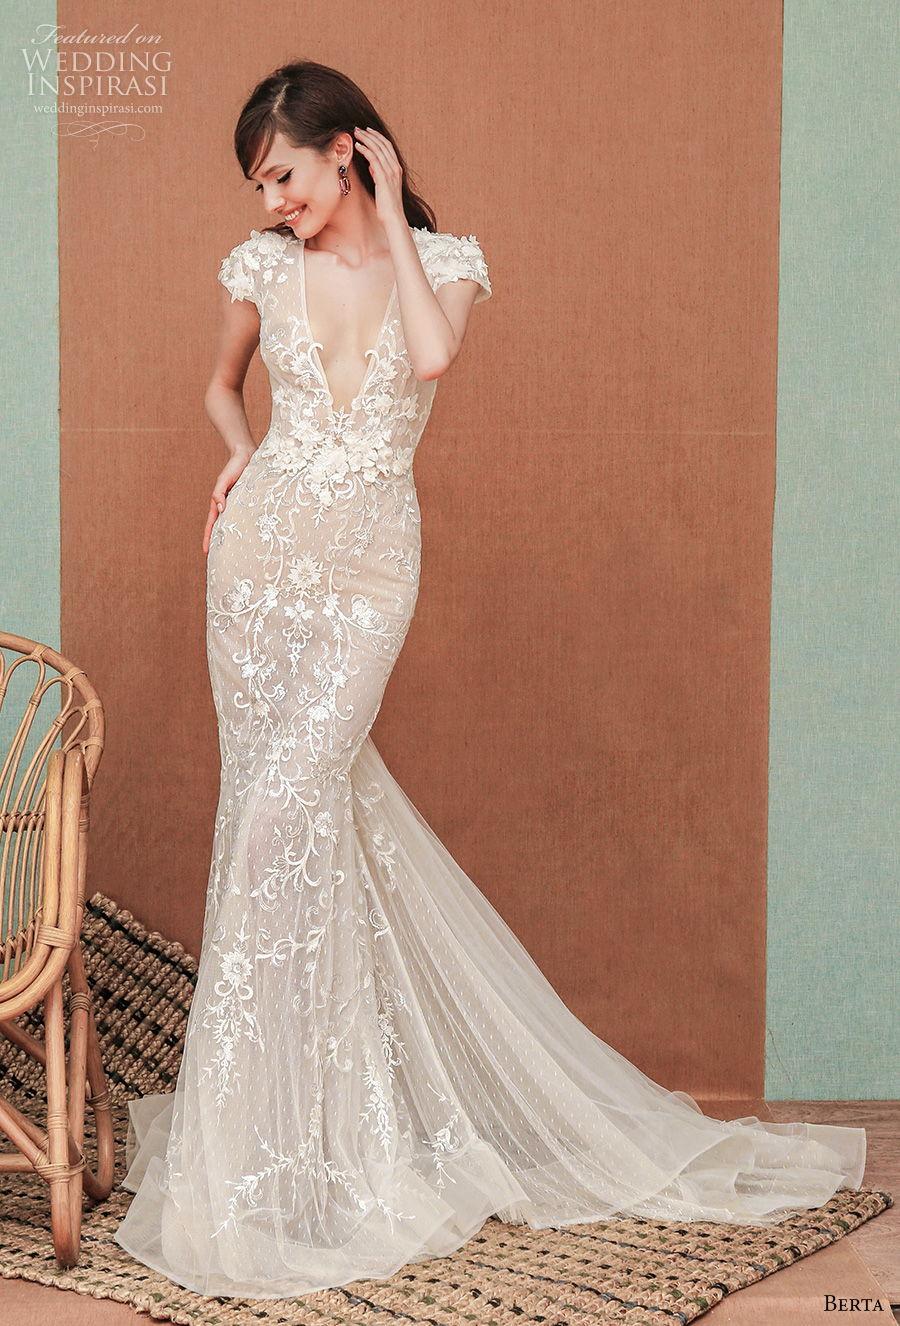 berta spring 2021 privee bridal cap sleeves deep v neck full embellishment sexy romantic fit and flare sheath wedding dress low back medium train (3) mv